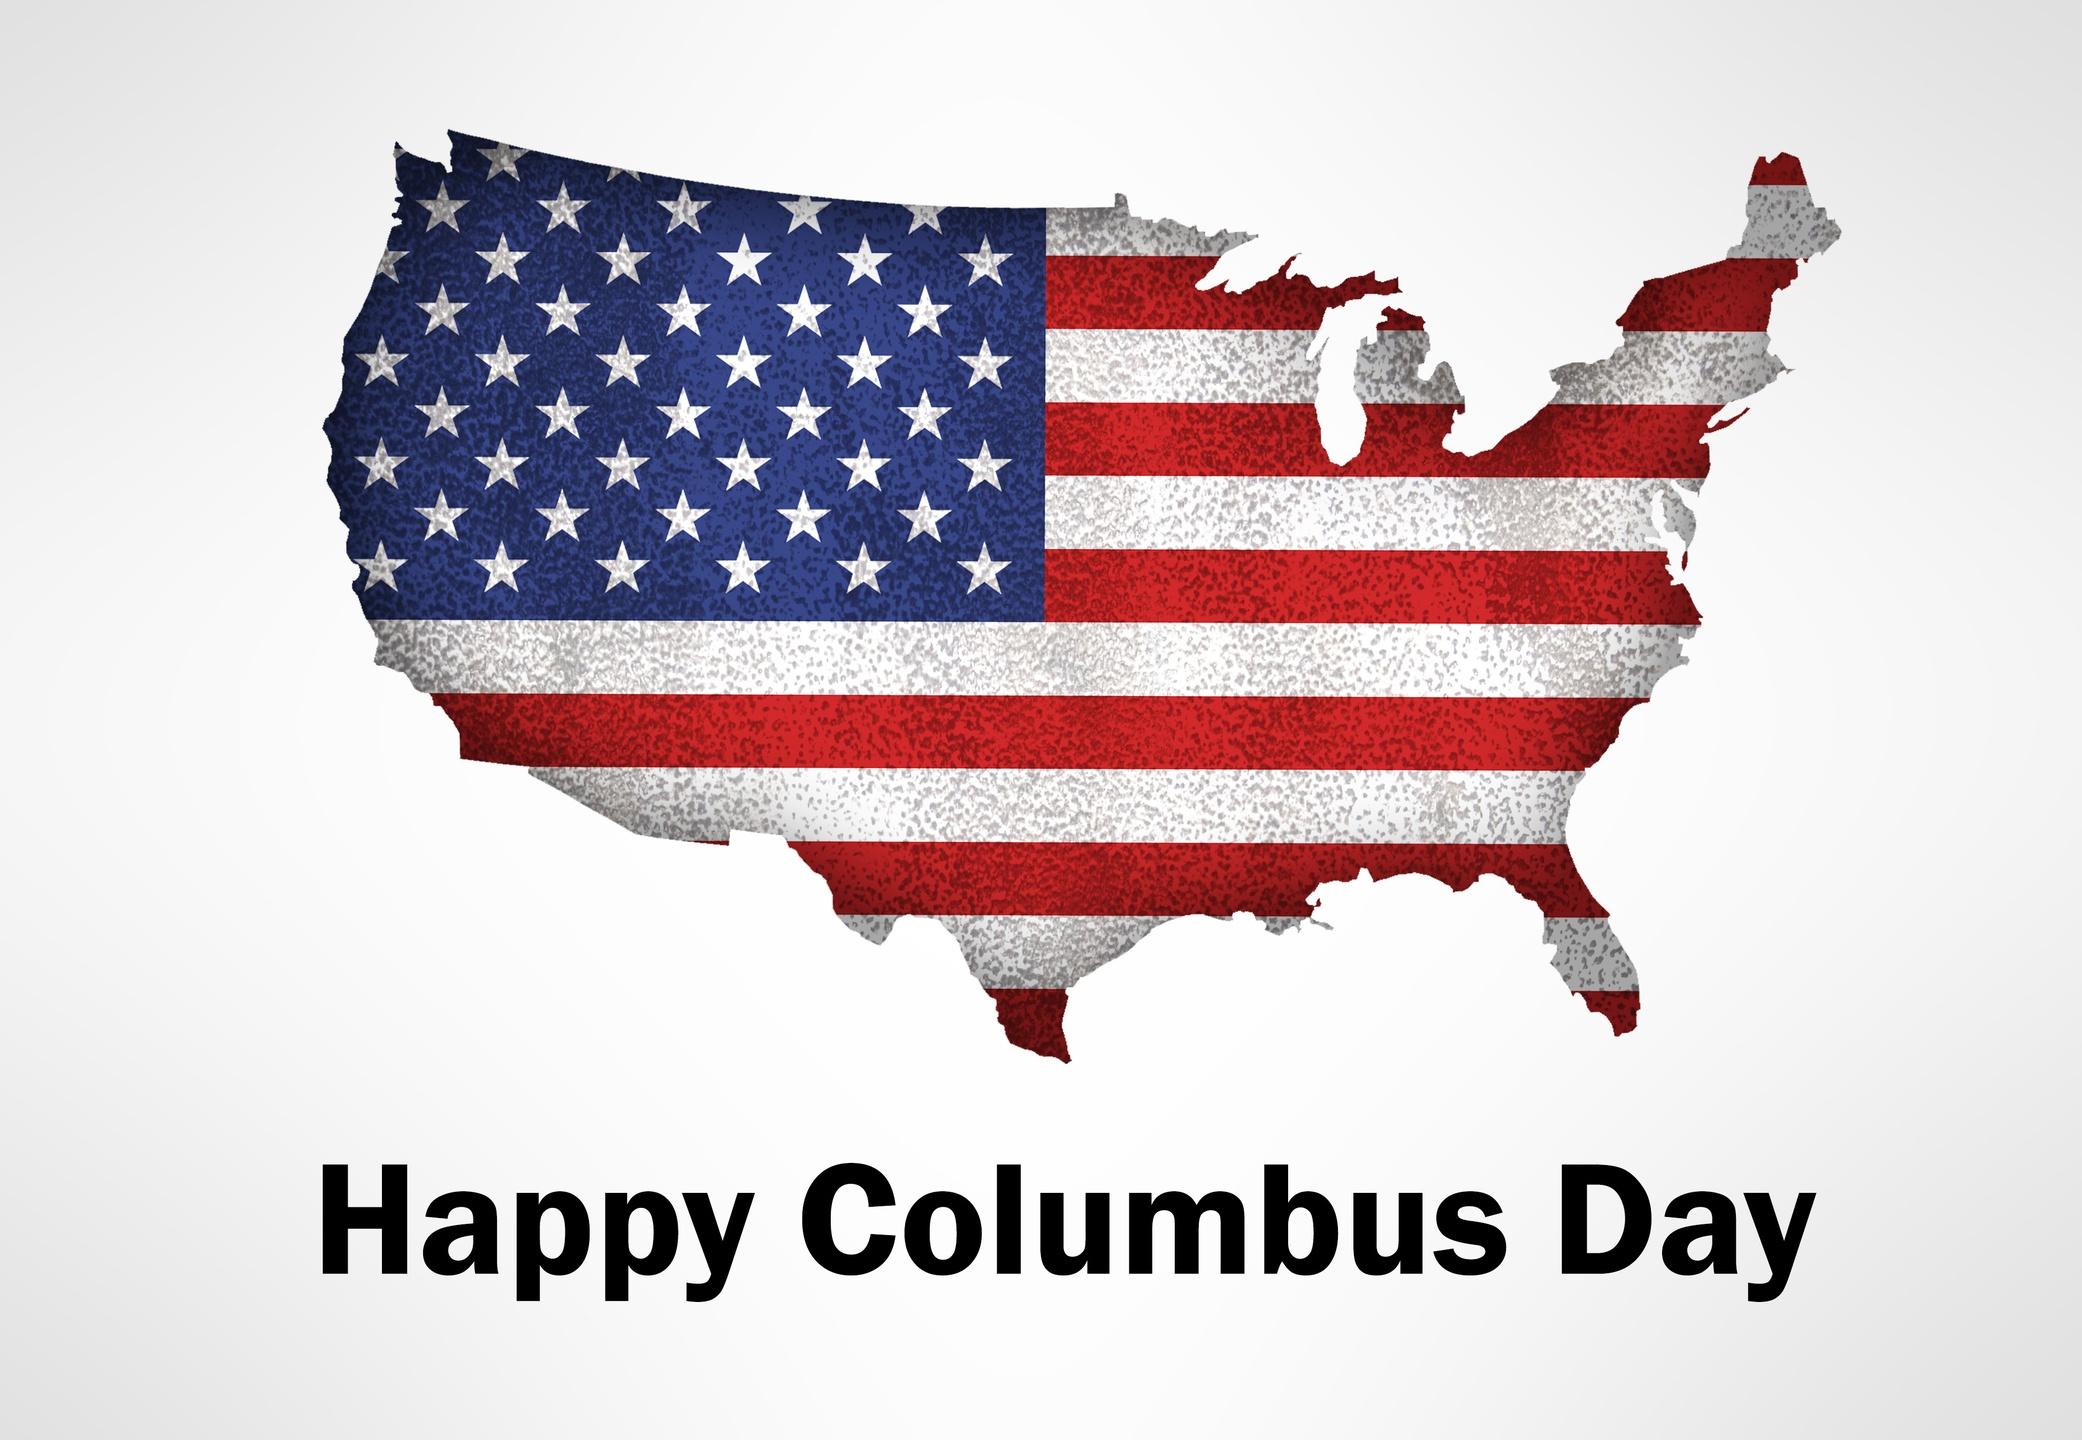 Colubus day flag.jpg